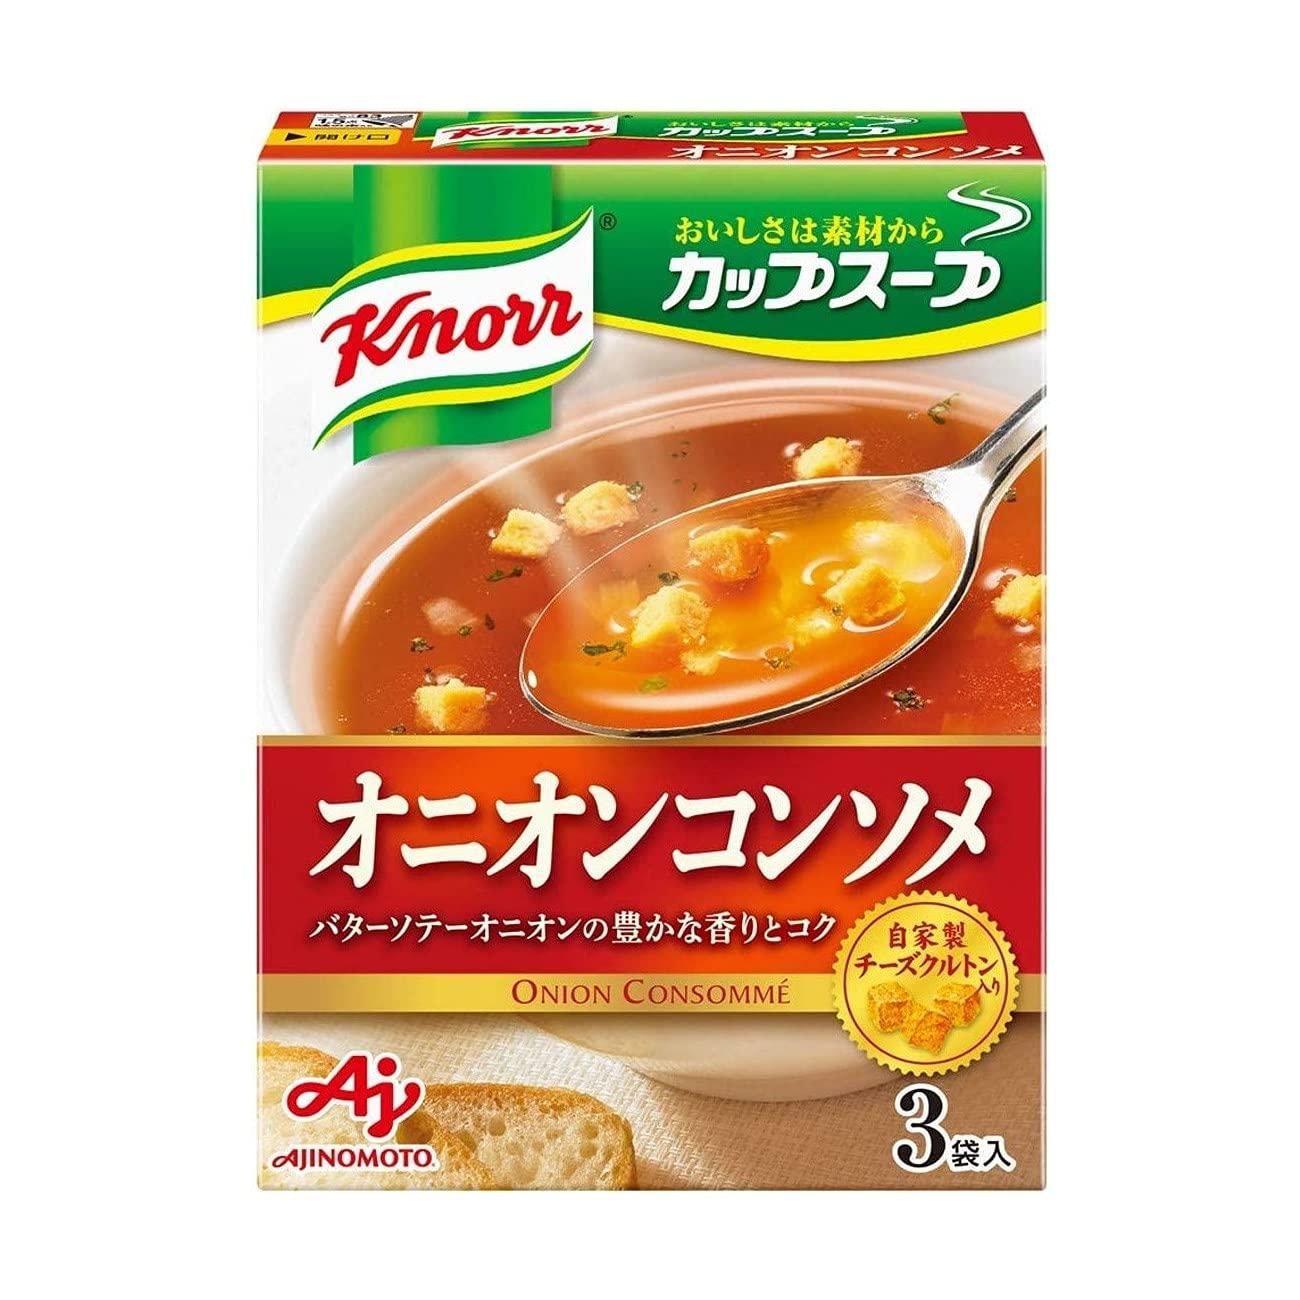 Knorr Cup Soup latest Onion Consomme 1.2oz Super intense SALE 5boxes Inst x 3bags Japanese